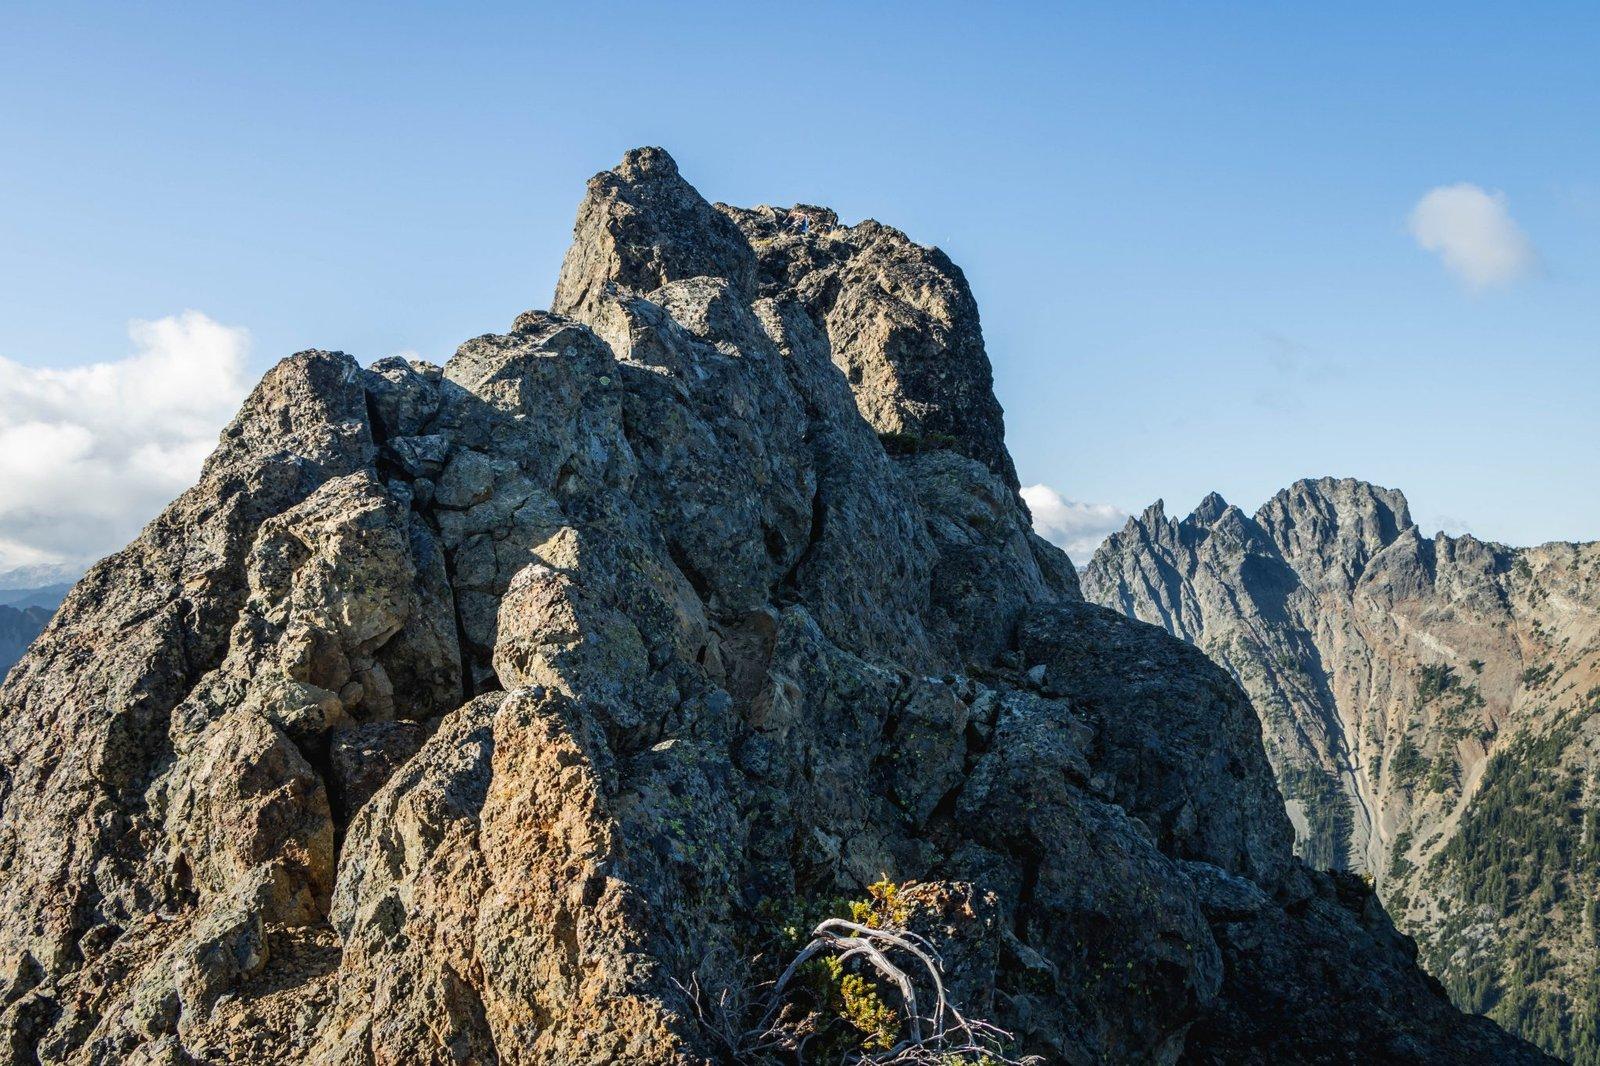 Leaving Lobox Mountain